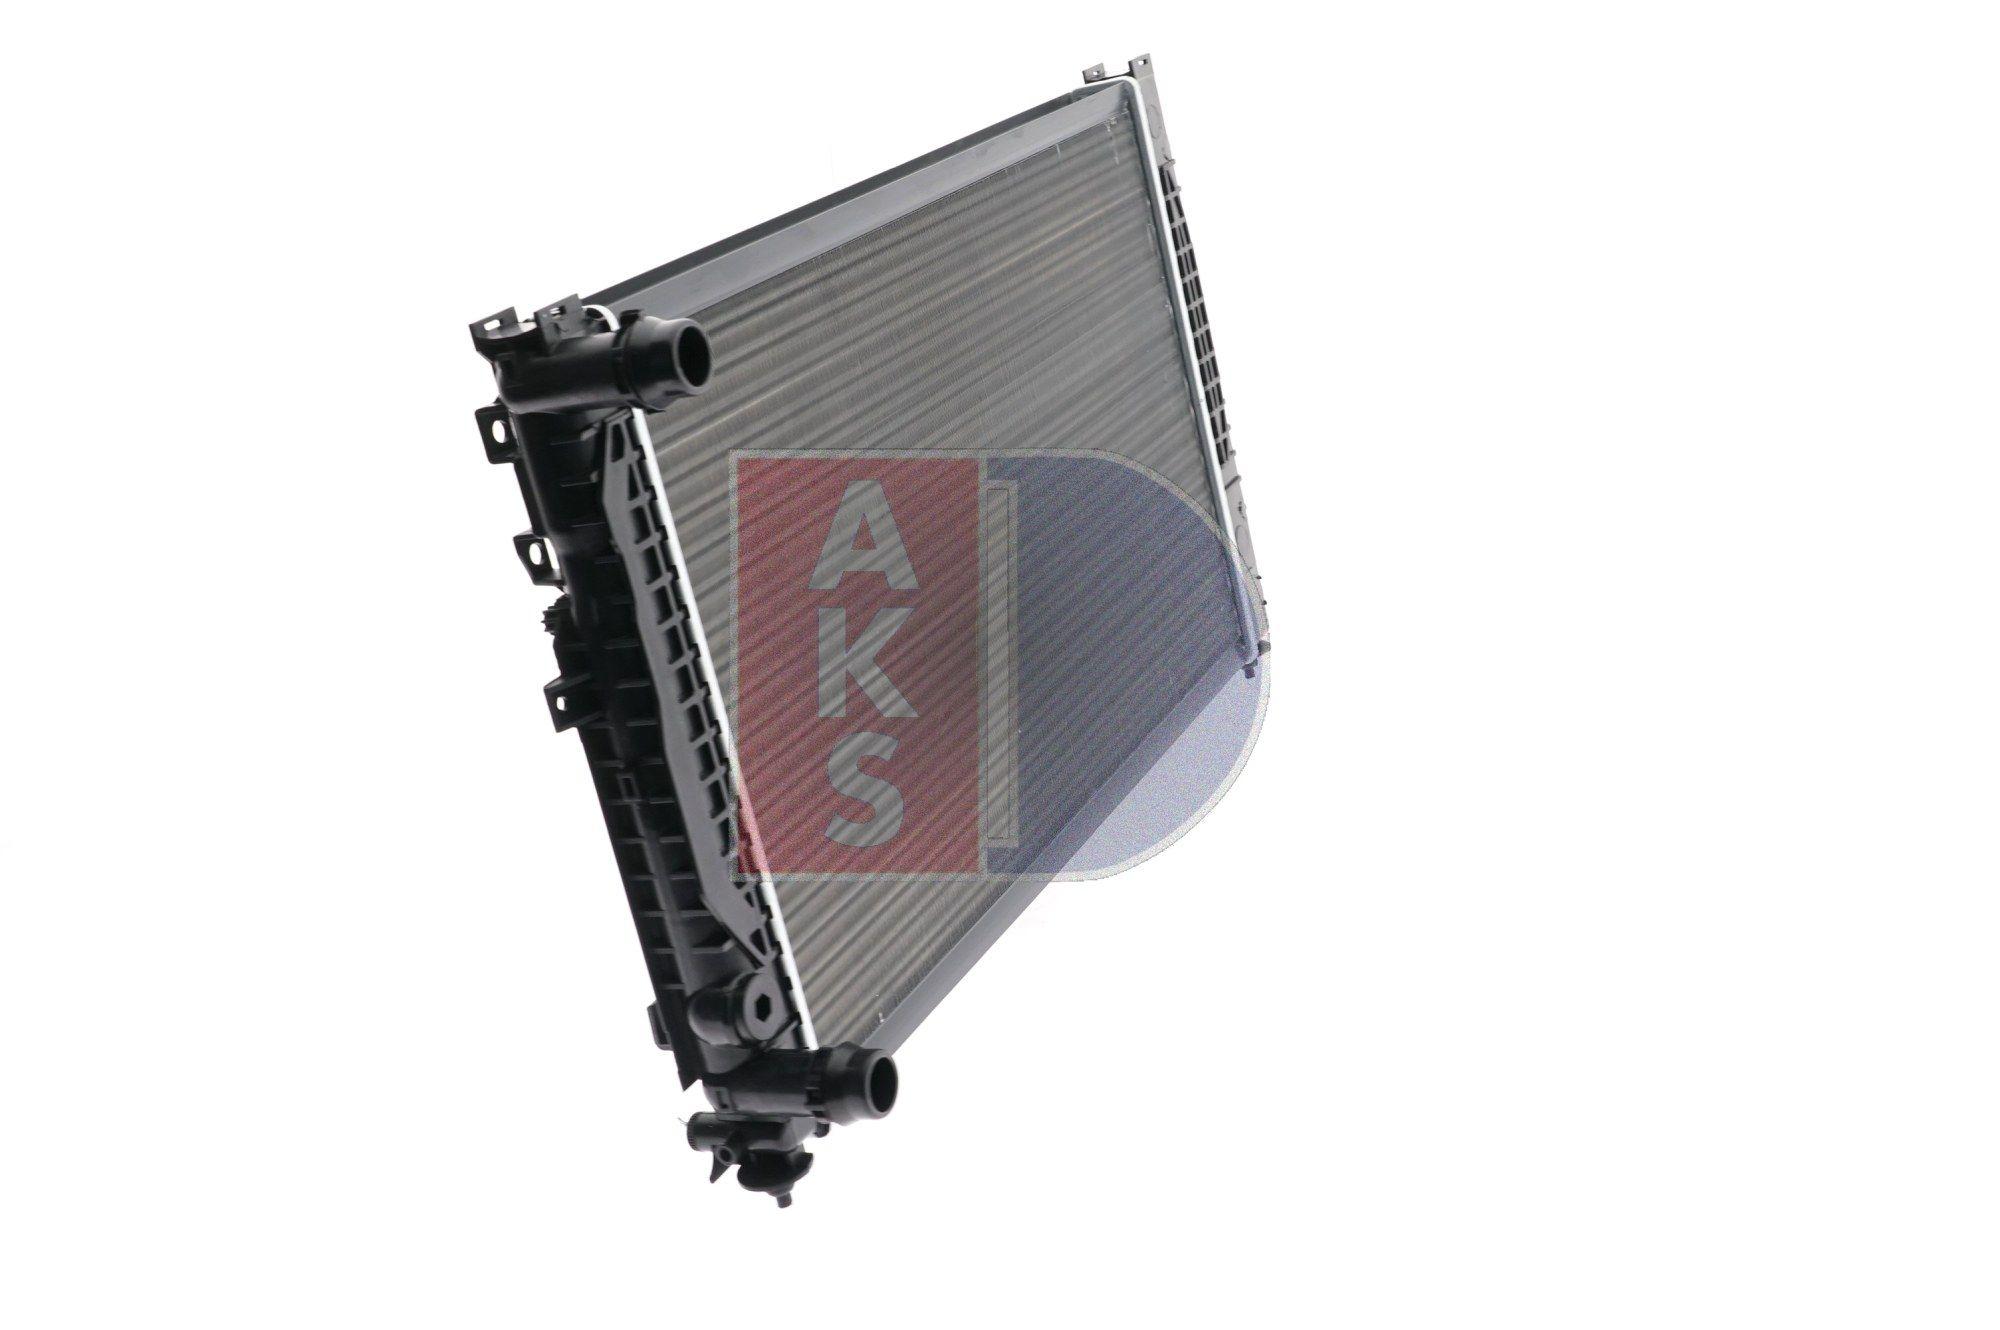 Kühler, Motorkühlung 480390N von AKS DASIS